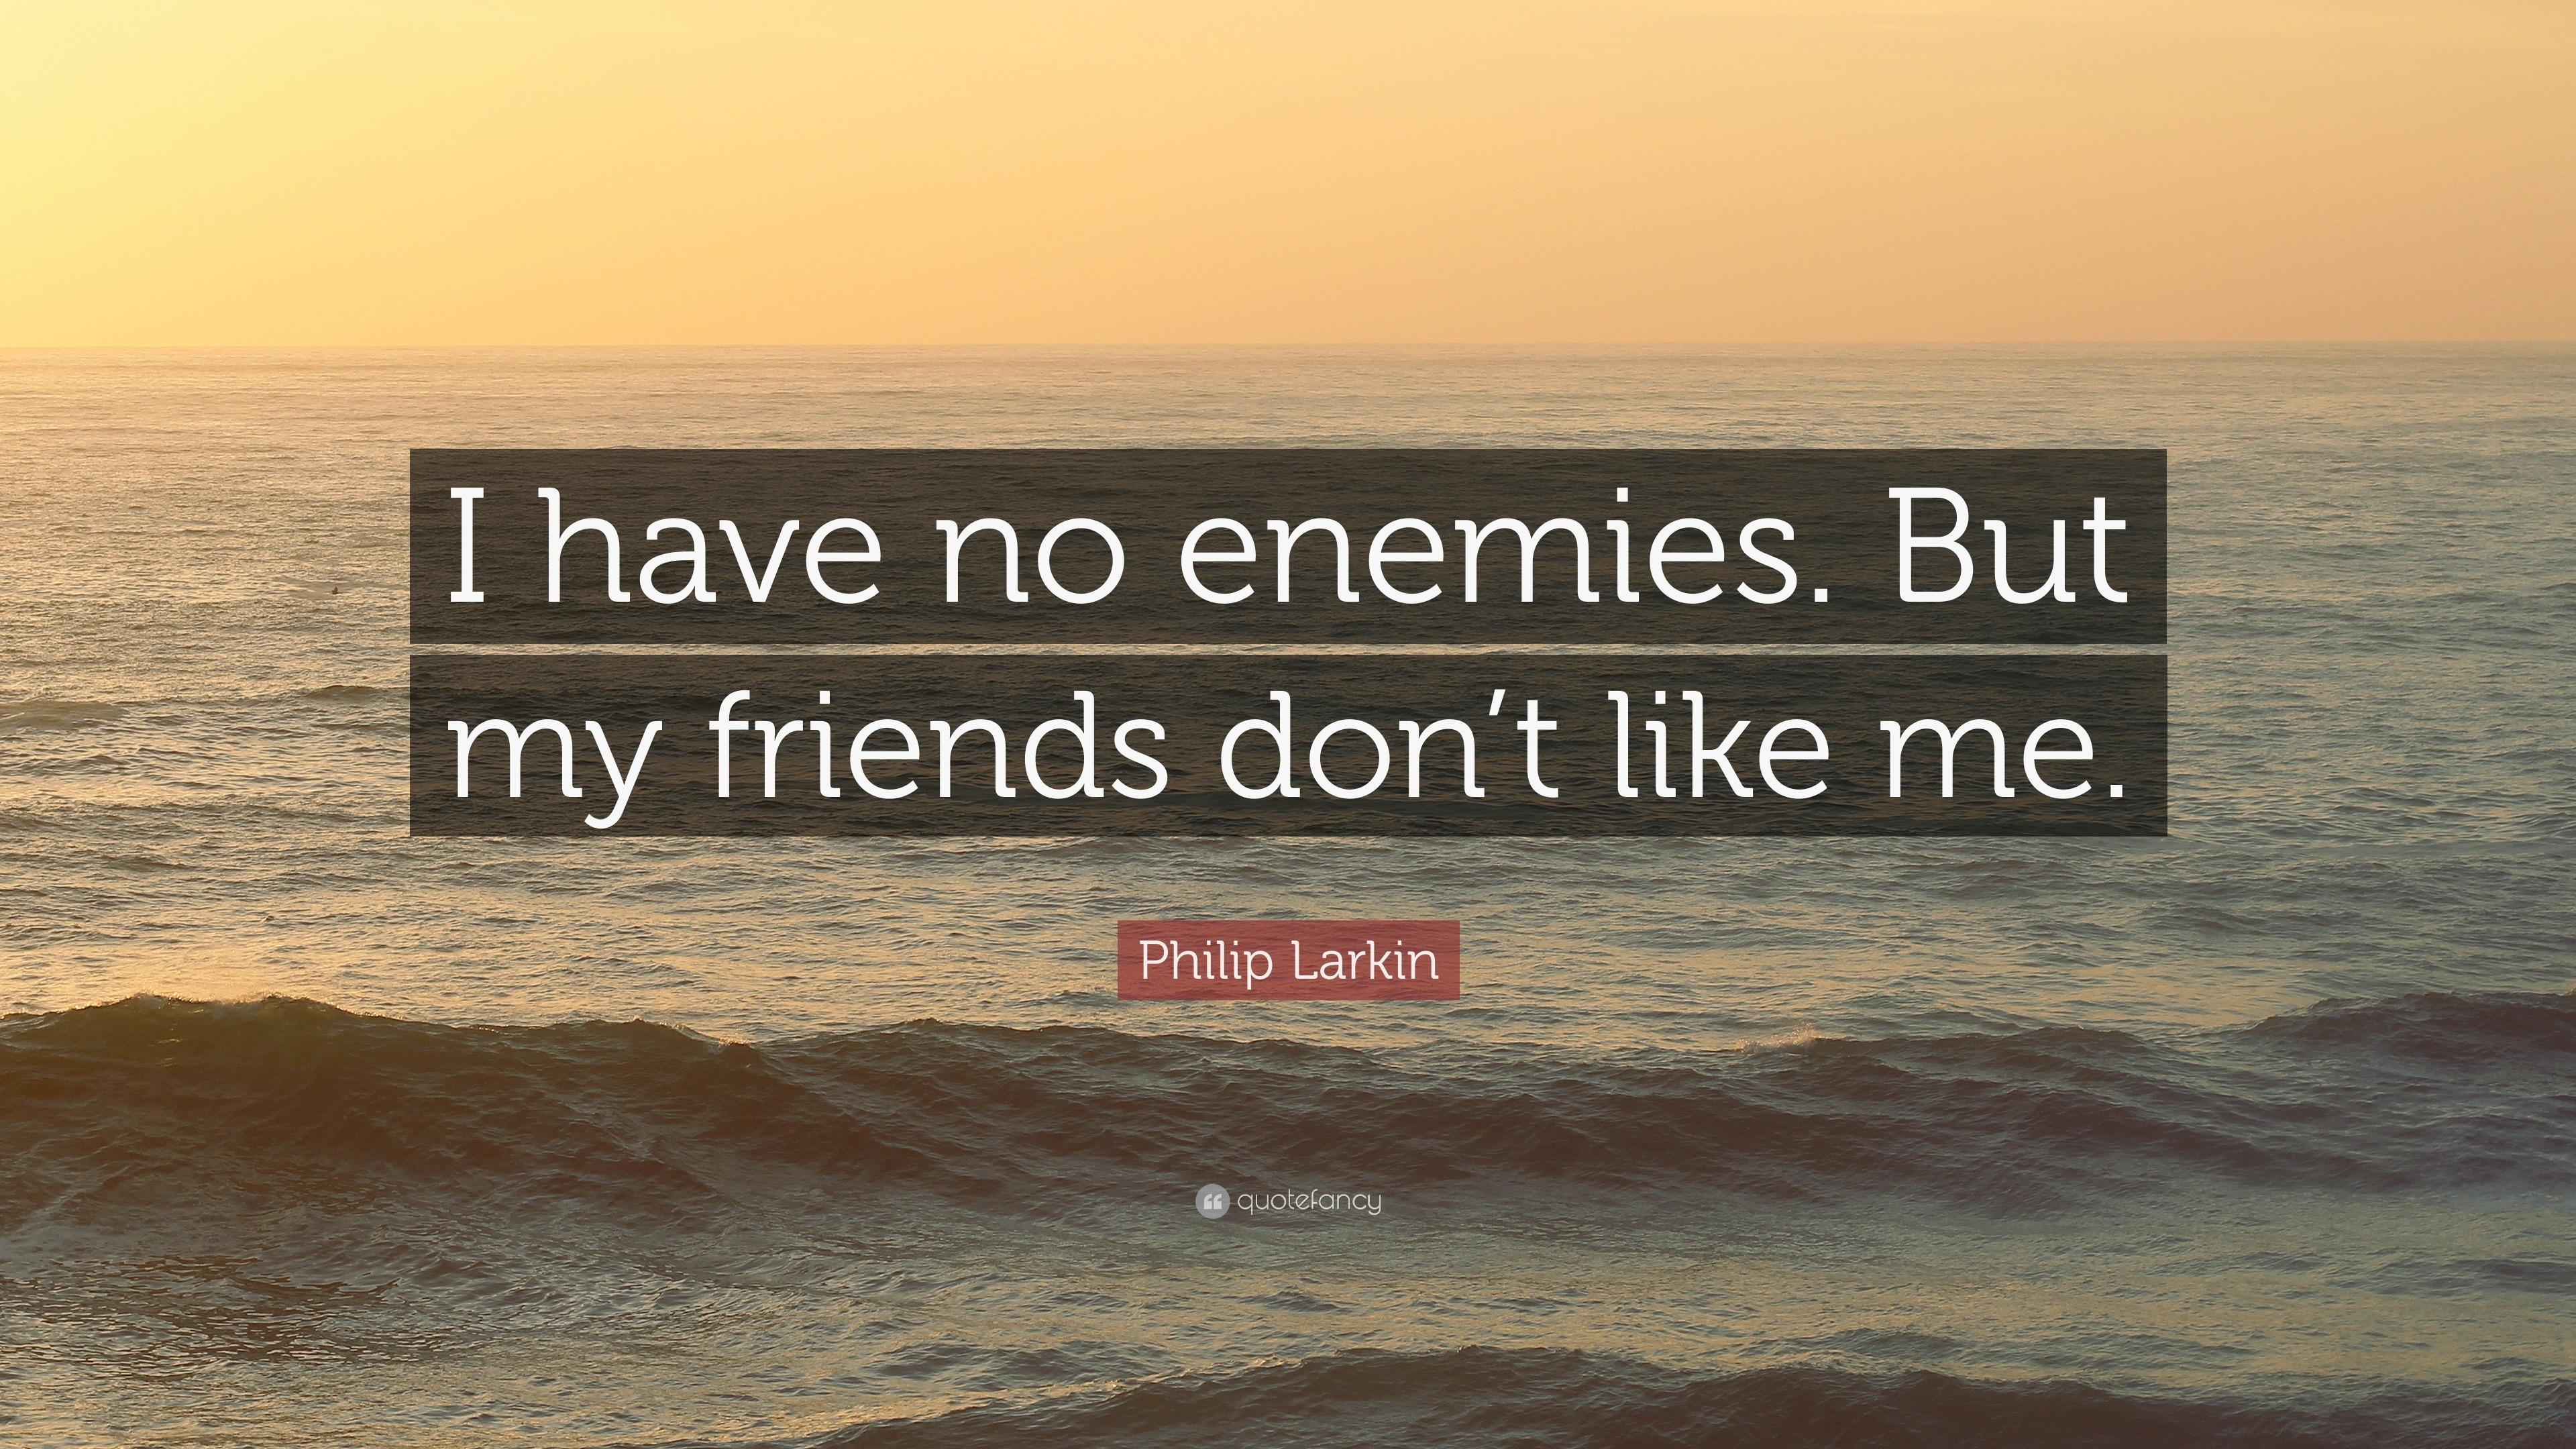 Philip Larkin Quote: I have no enemies. But my friends